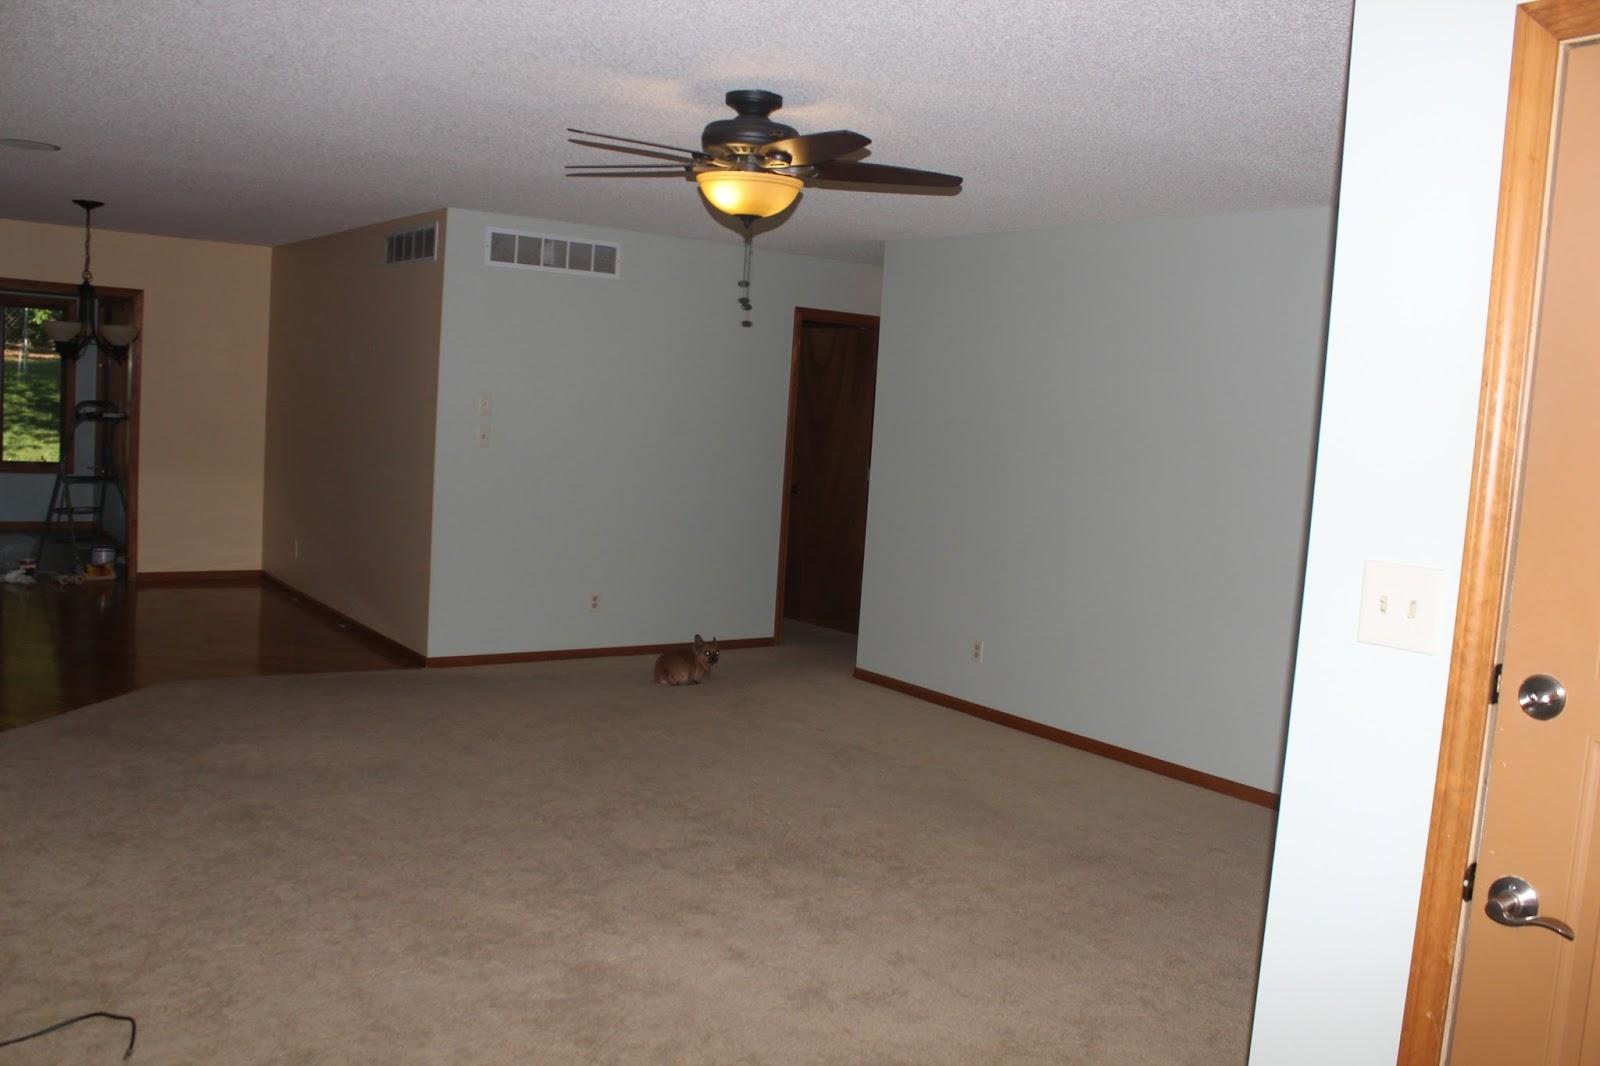 DIY Wall Art & A Living Room Wish List - Whimsical September